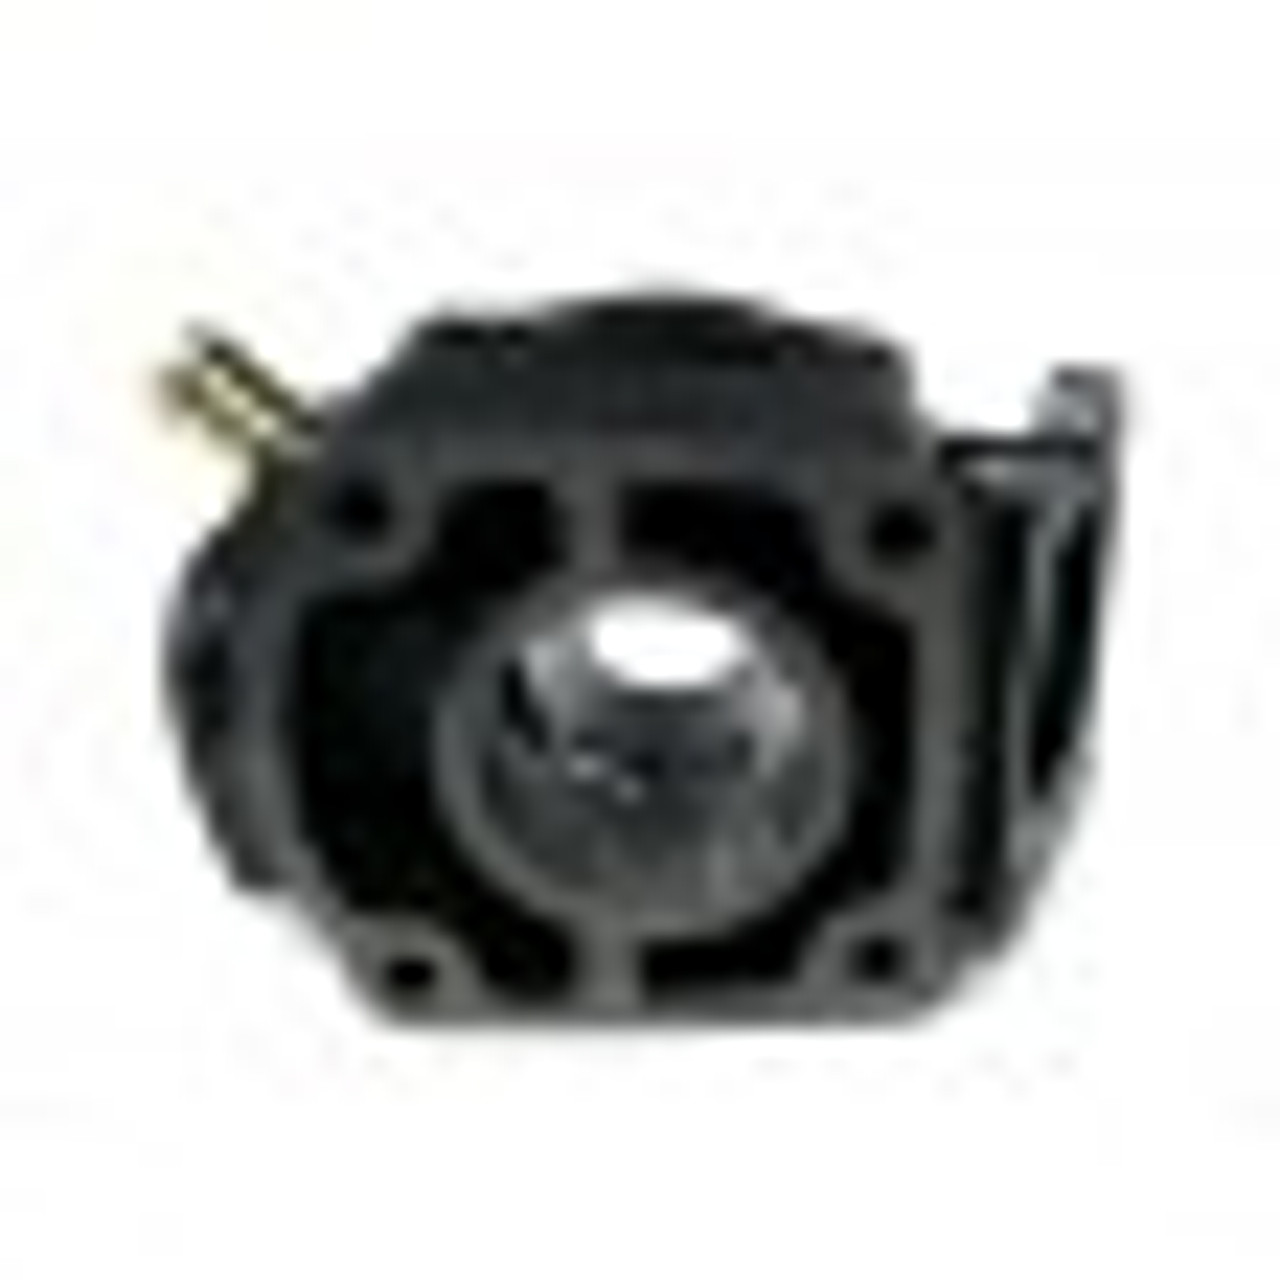 Honda NSR50, NS1, NS50f 46mm 70cc Cylinder Kit - No Gaskets